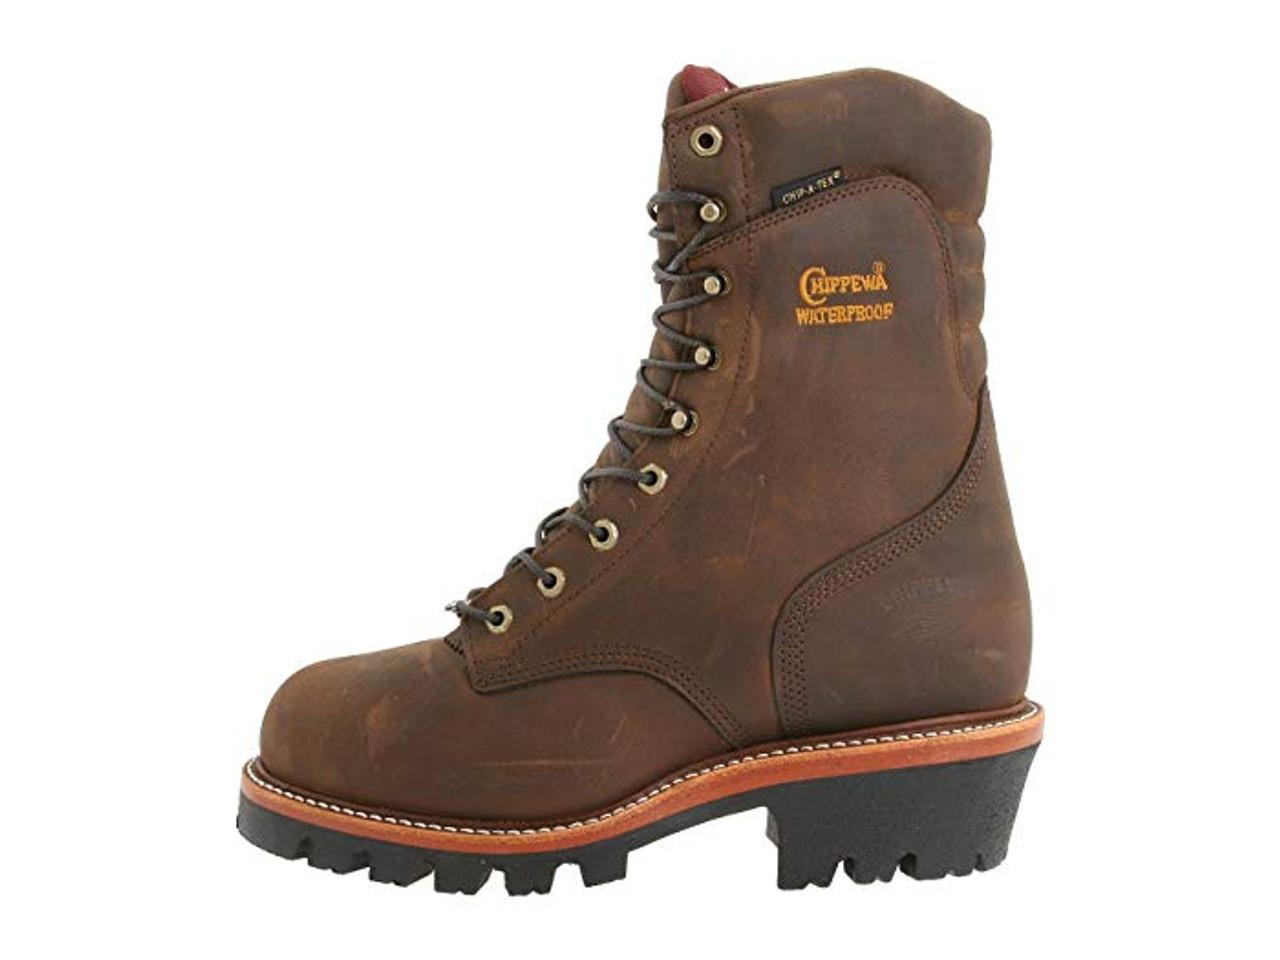 chippewa super logger boots on sale